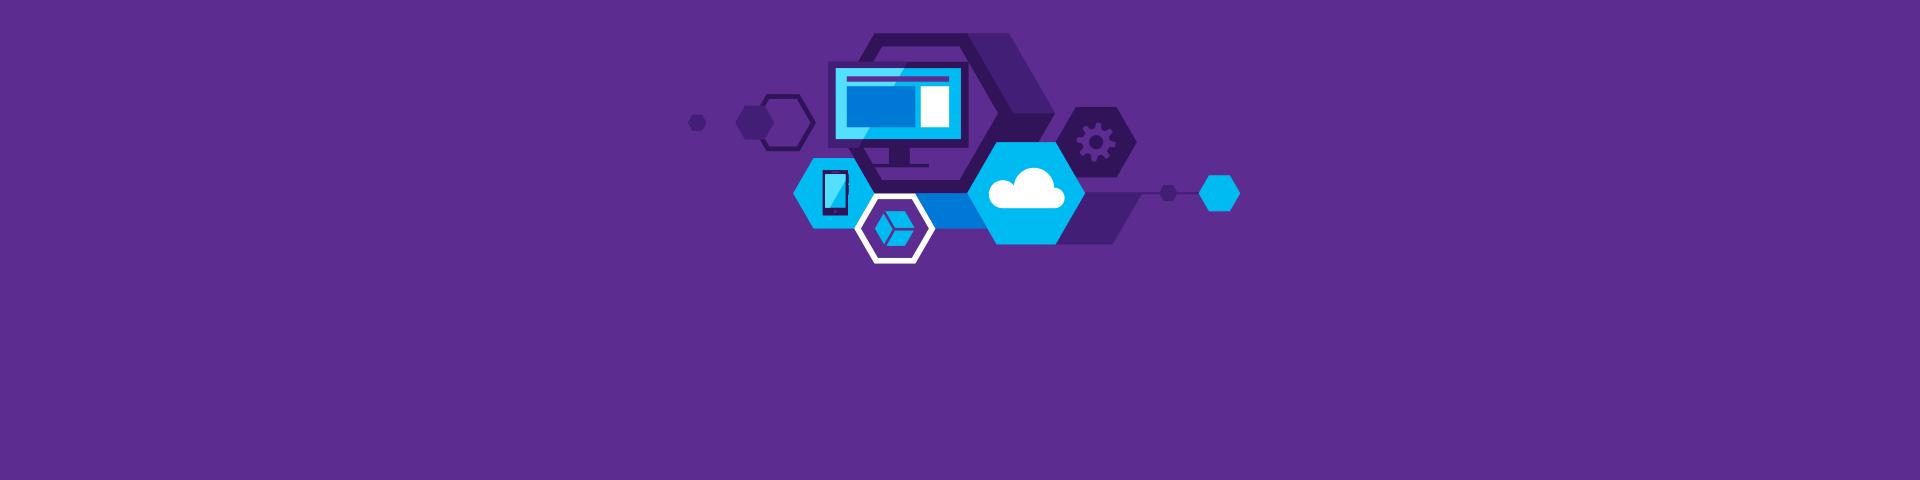 PC, Smartphone, Cloud und andere Technologiesymbole